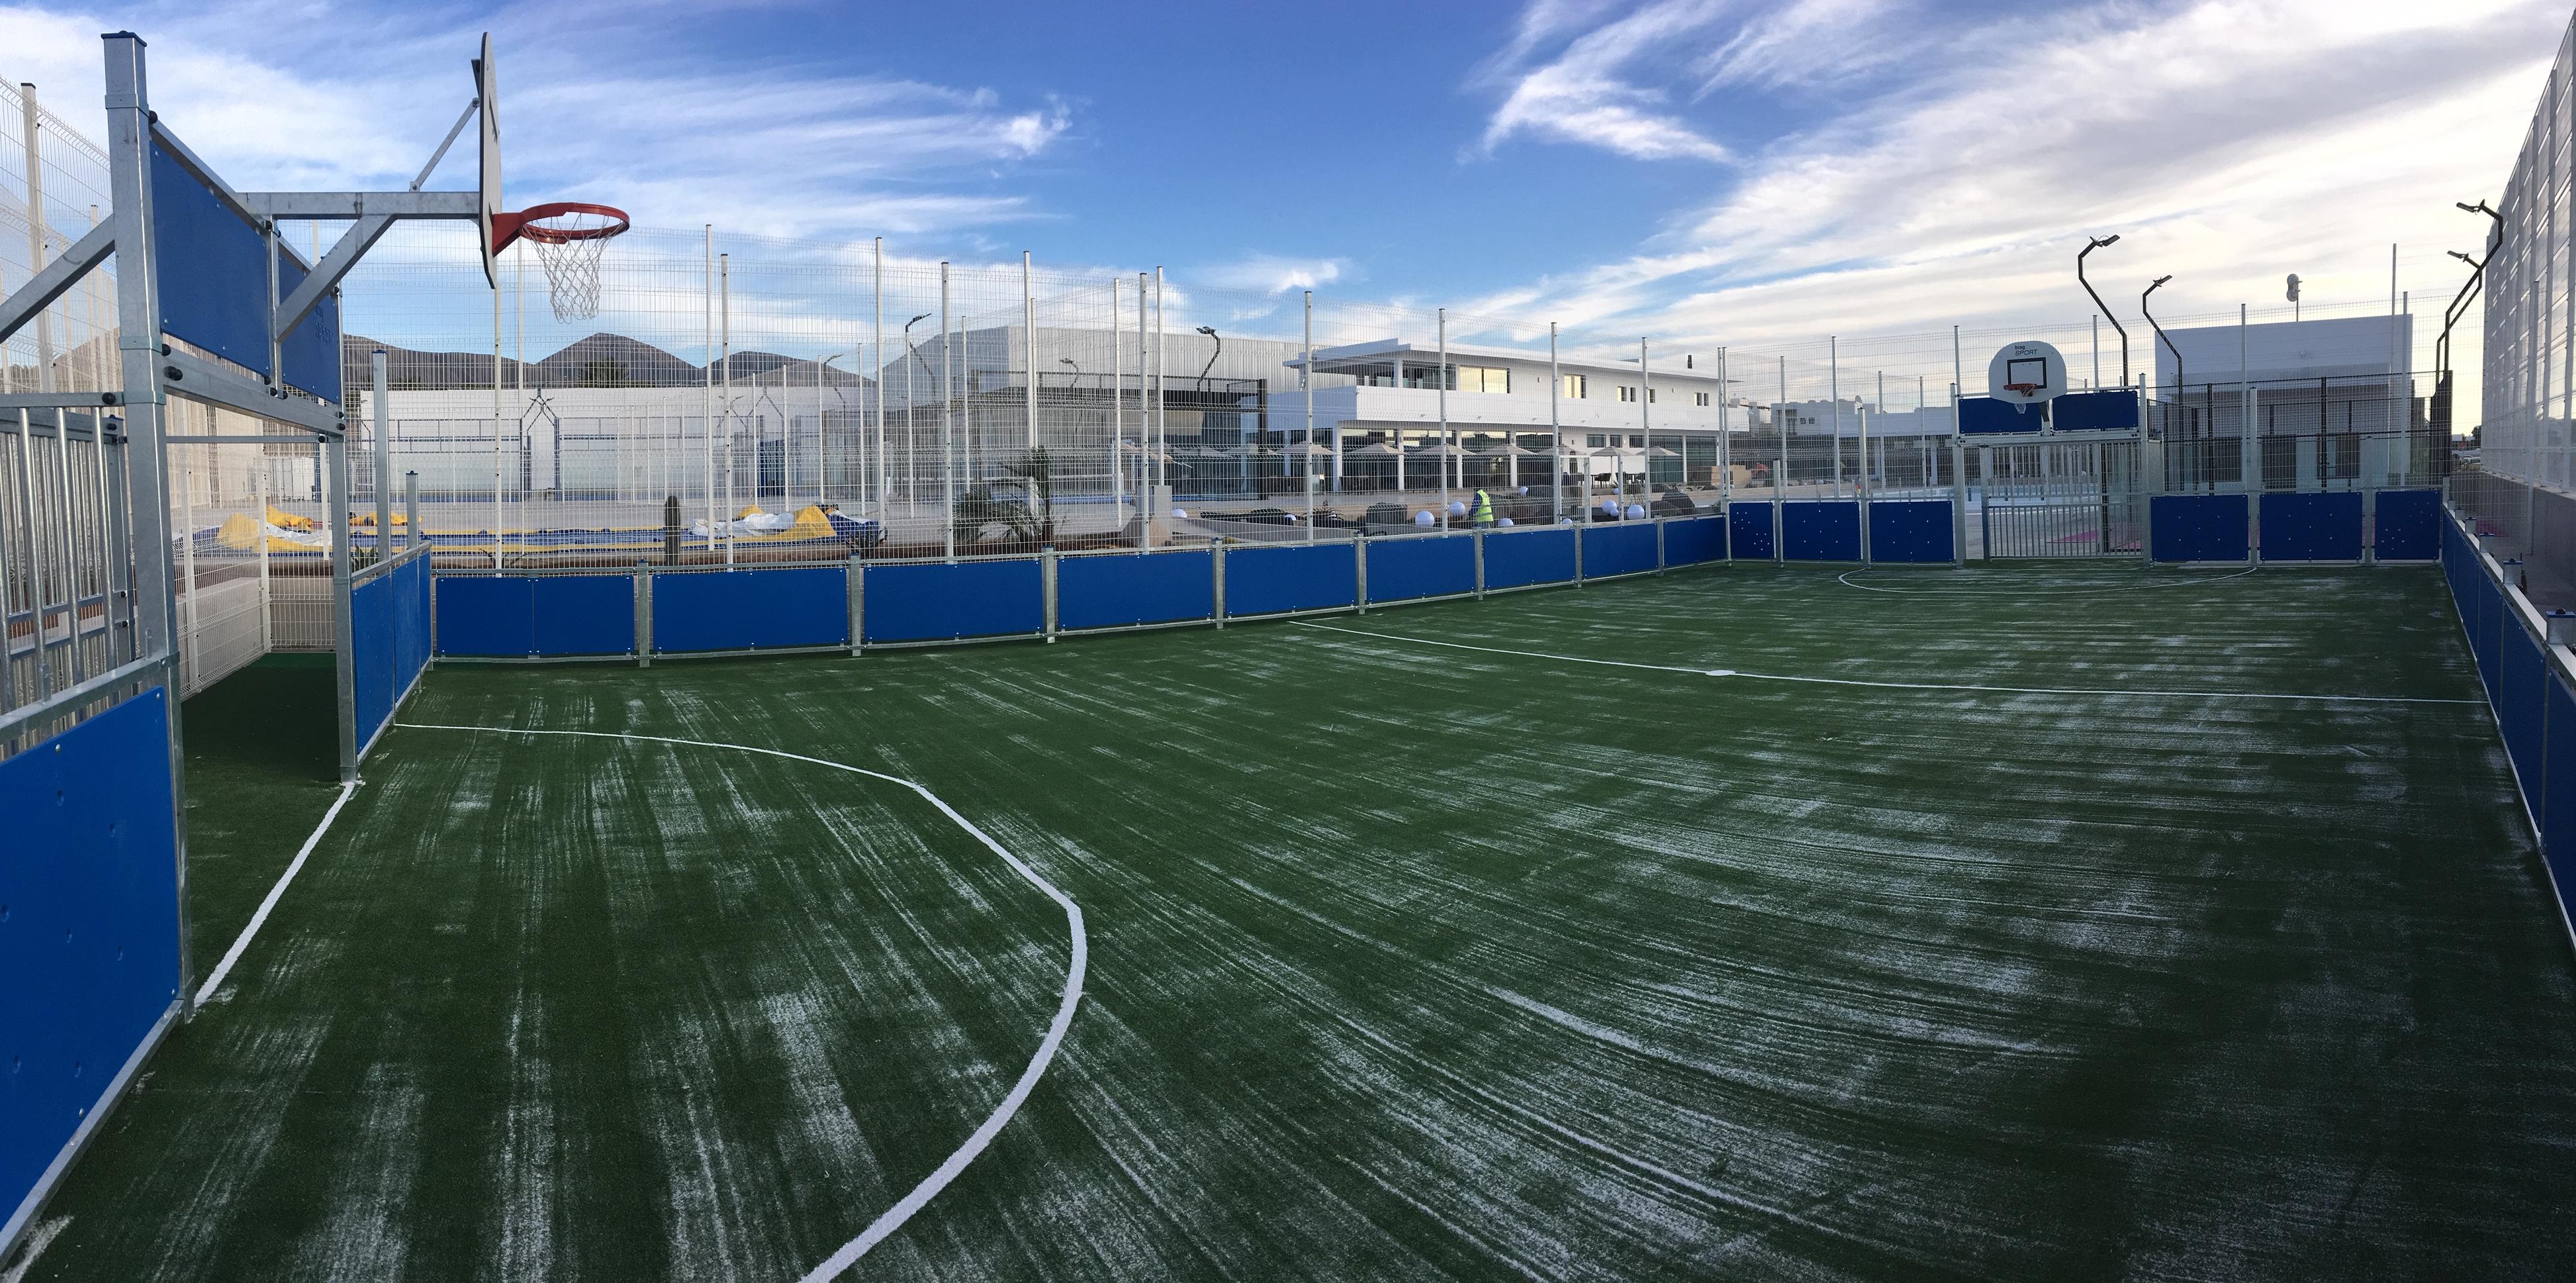 Centro deportivo cancha multideporte